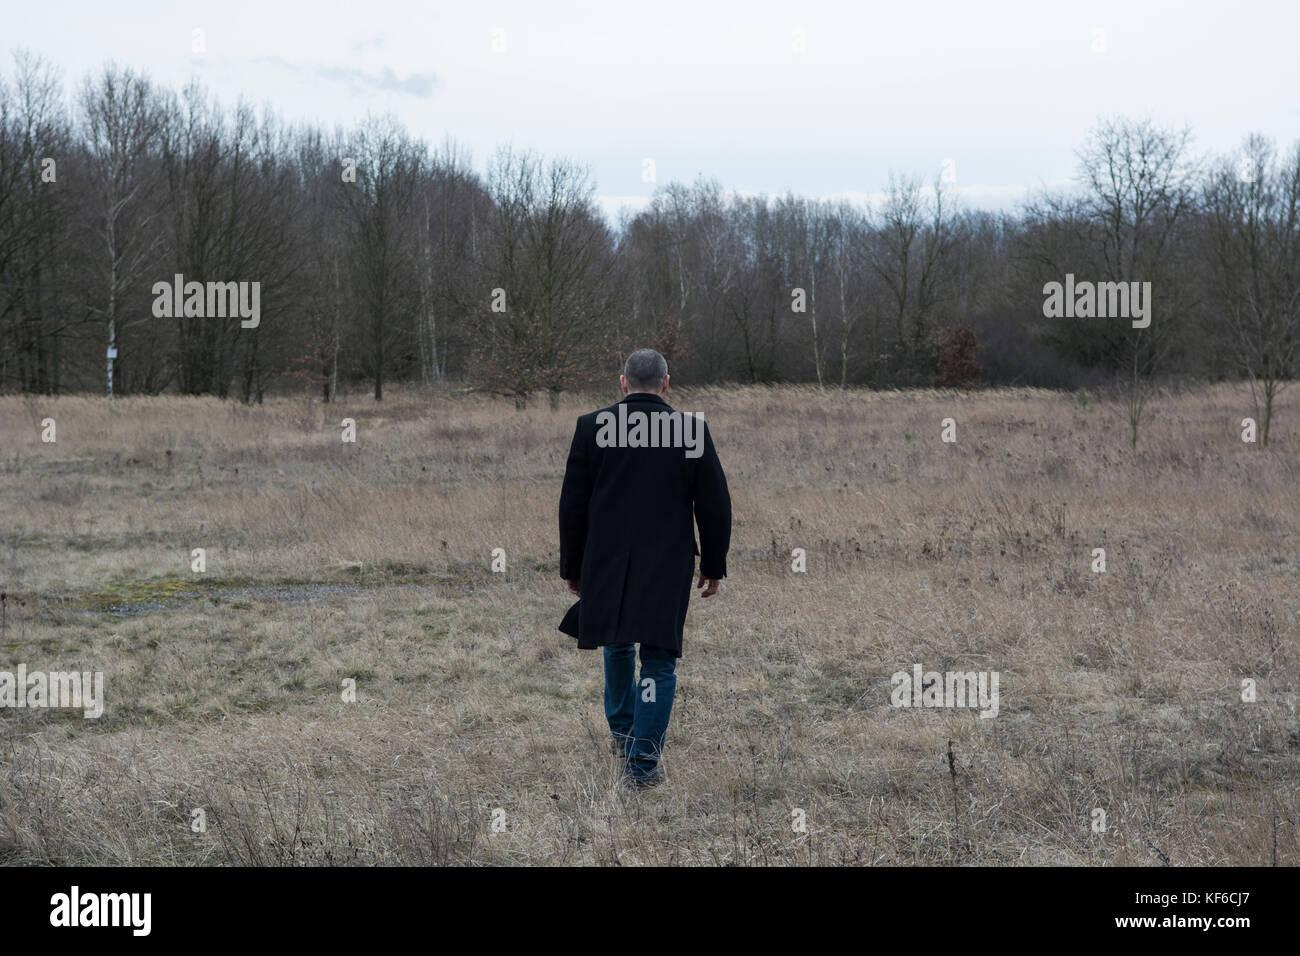 Full length rear view of a man wearing a coat walking away in a field - Stock Image